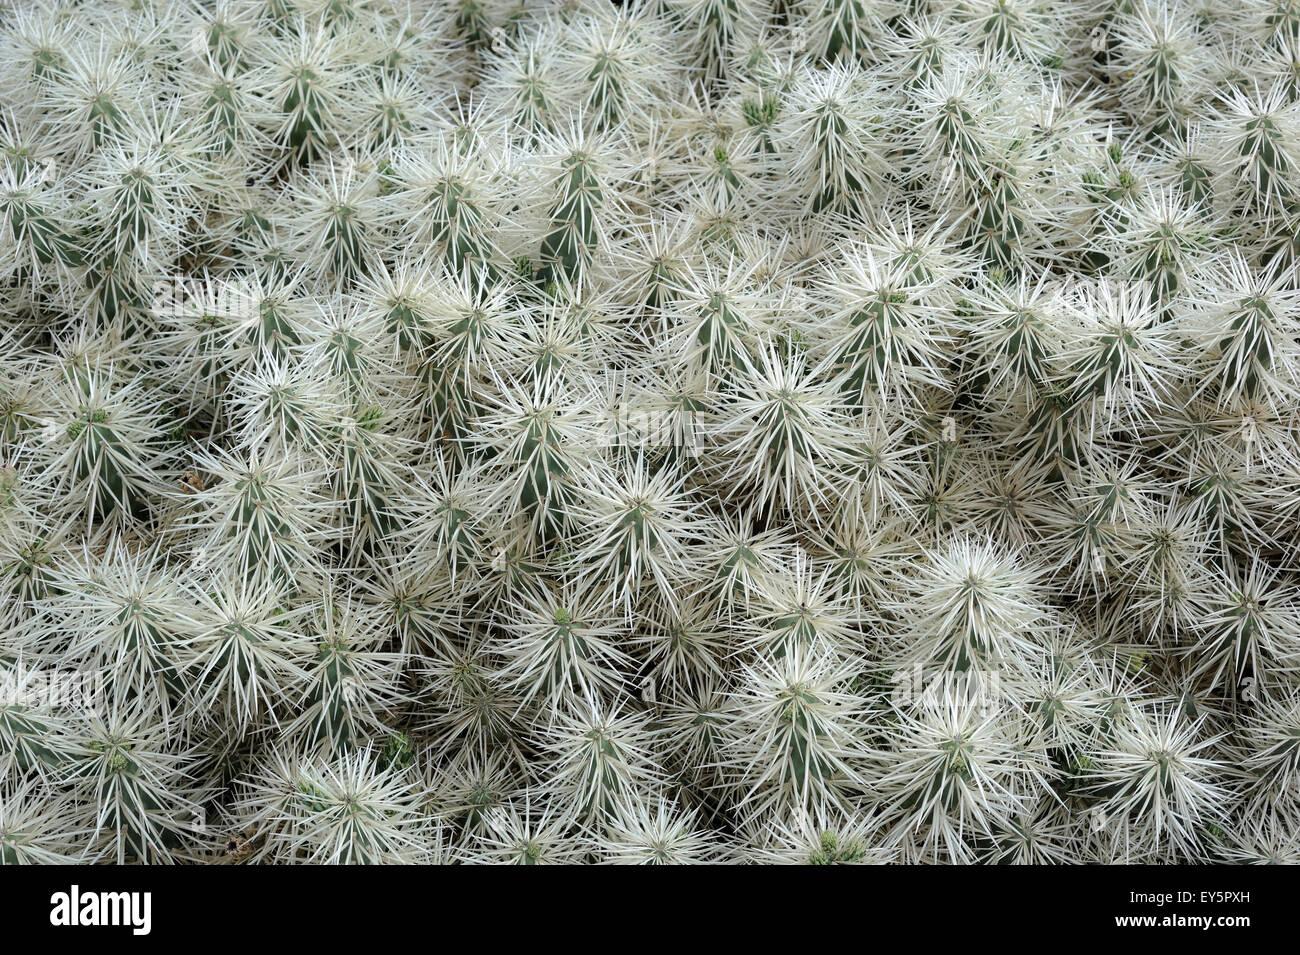 Opuntia Cactus - Lanzarote Canary Islands Stock Photo